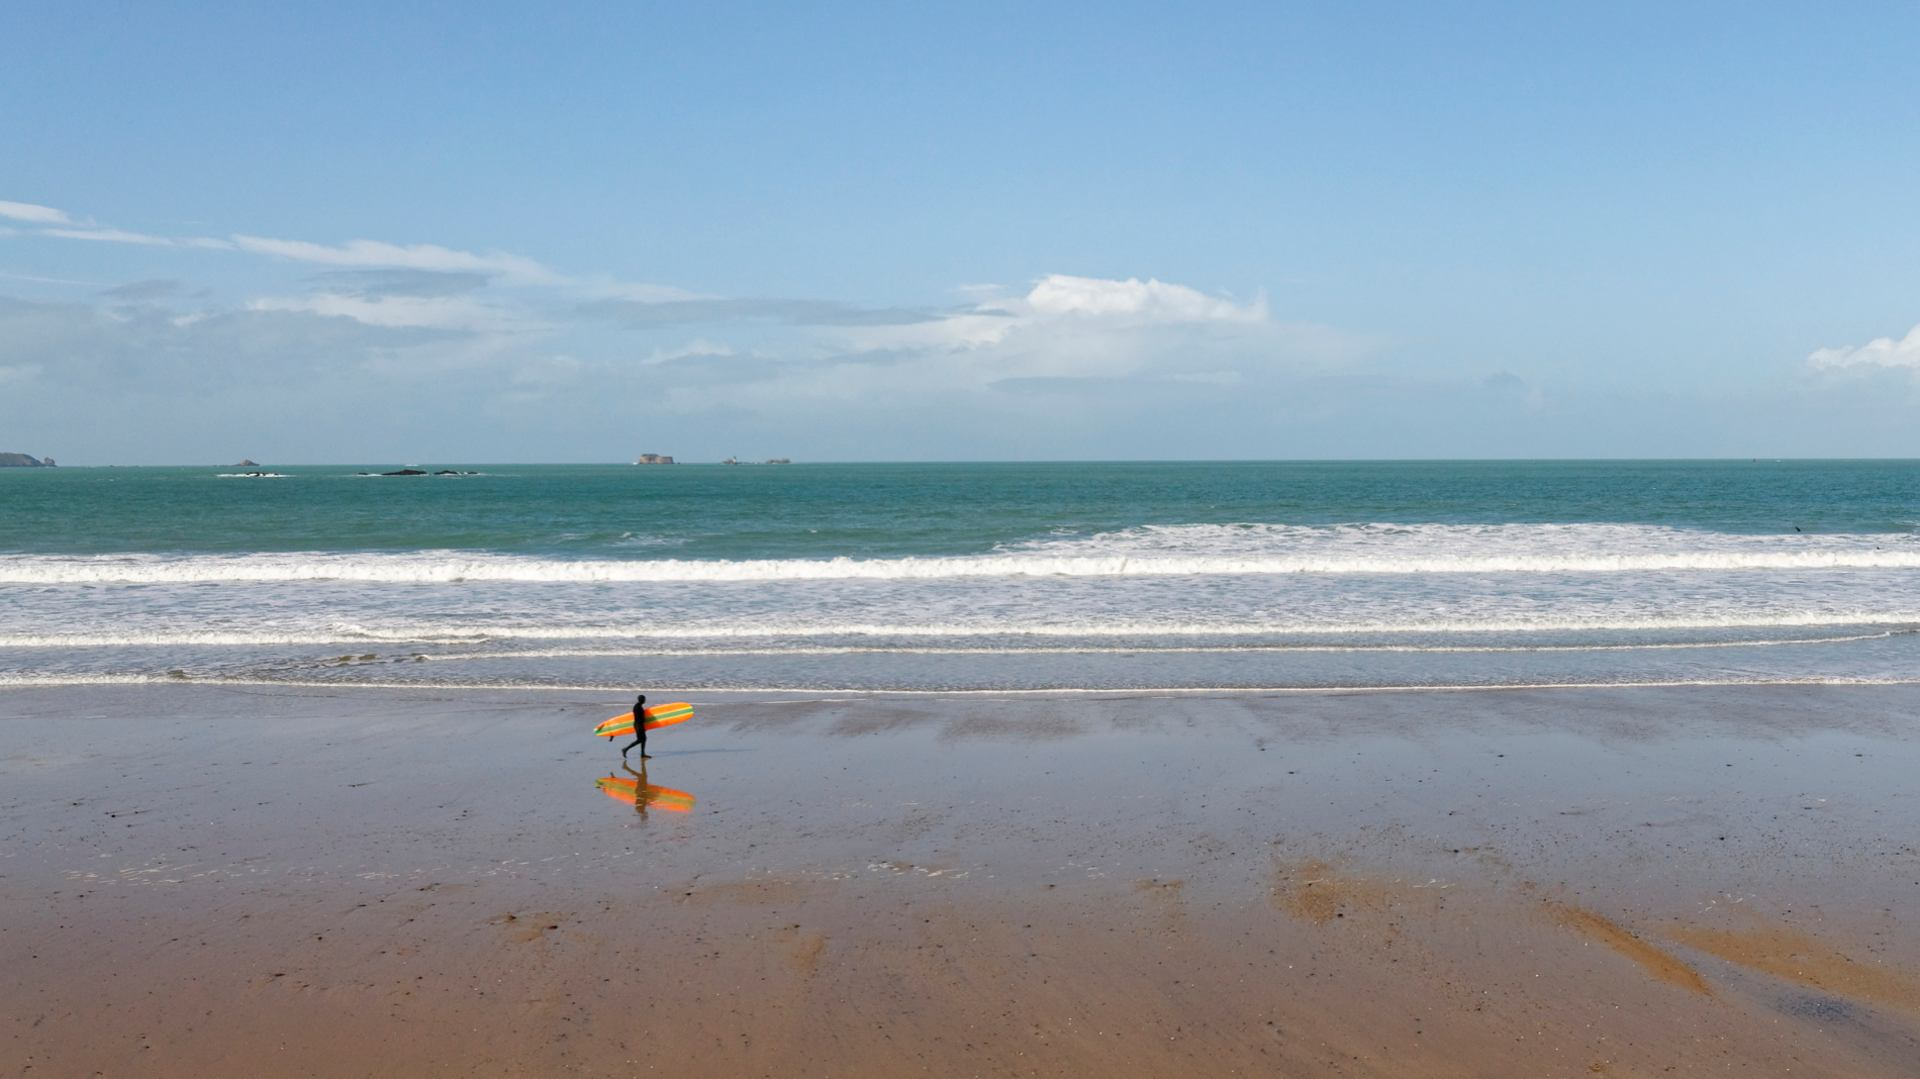 Surfer solitaire